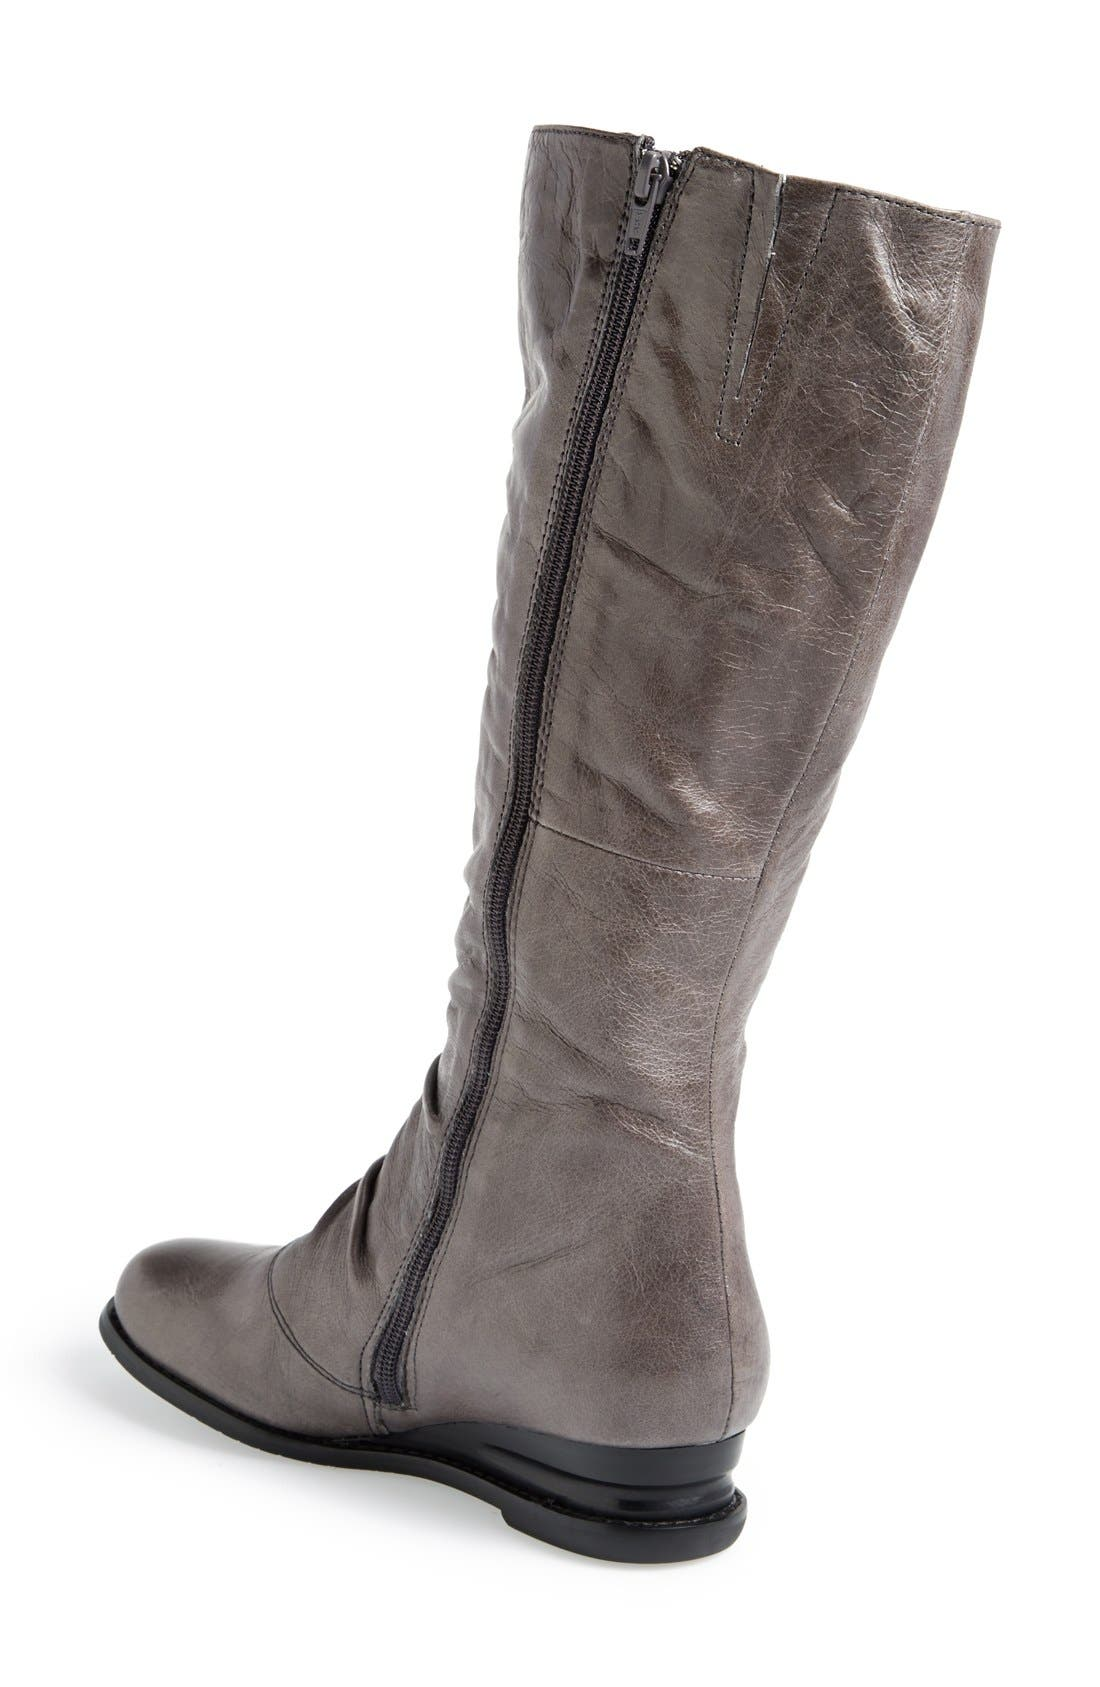 Alternate Image 2  - Miz Mooz 'Bloom' Leather Boot (Women)(Wide Calf)